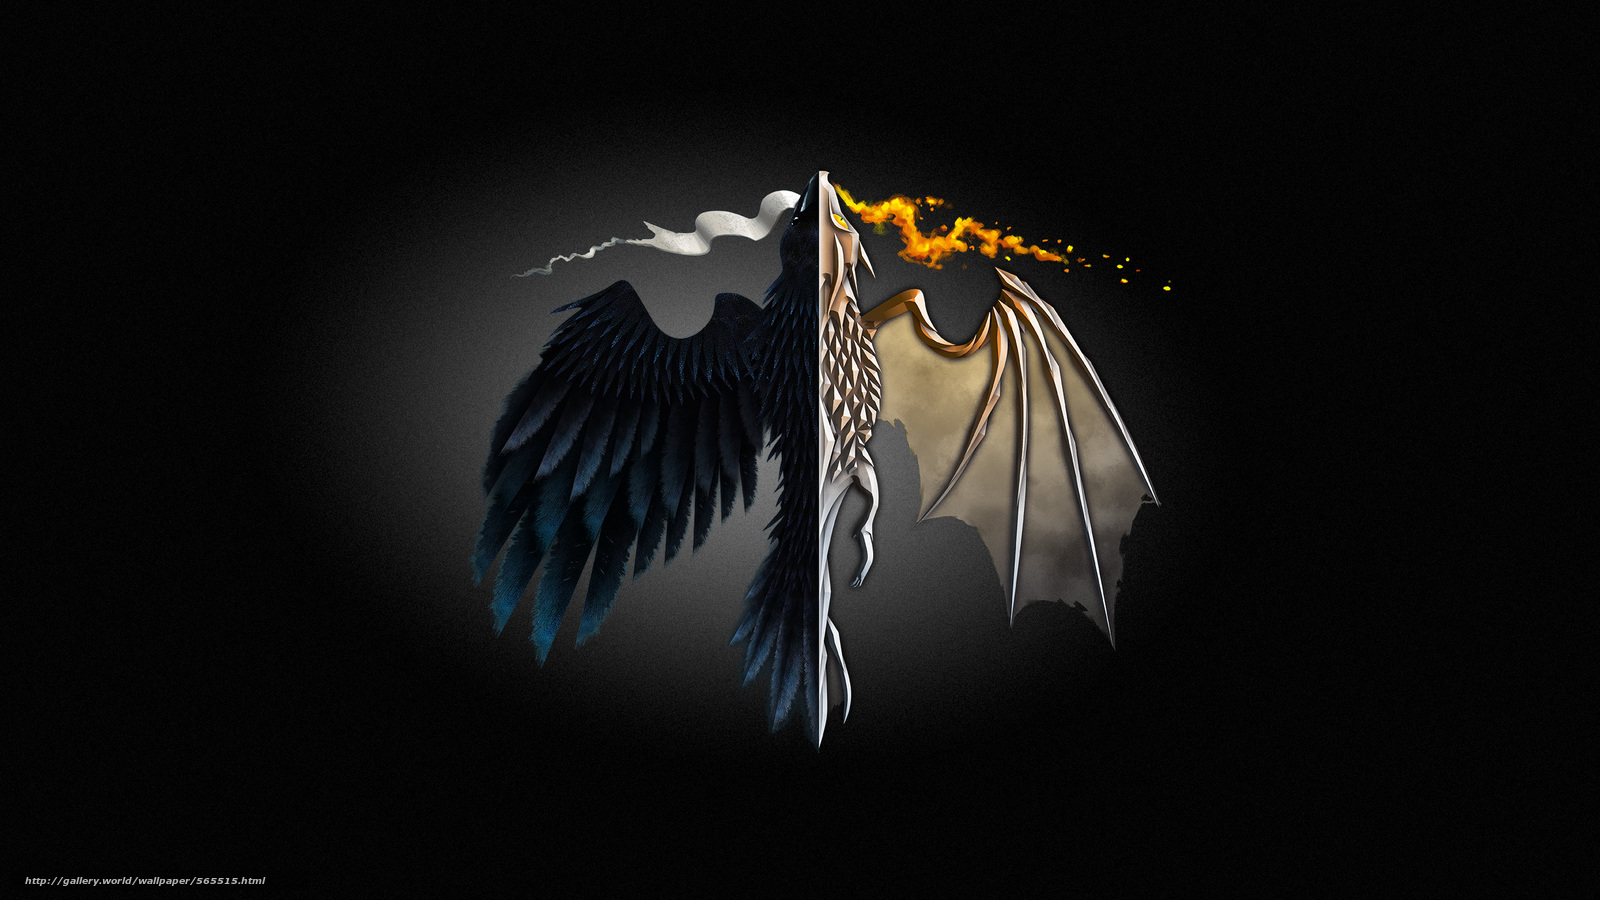 49 Game Of Thrones Wallpaper 2560x1440 On Wallpapersafari